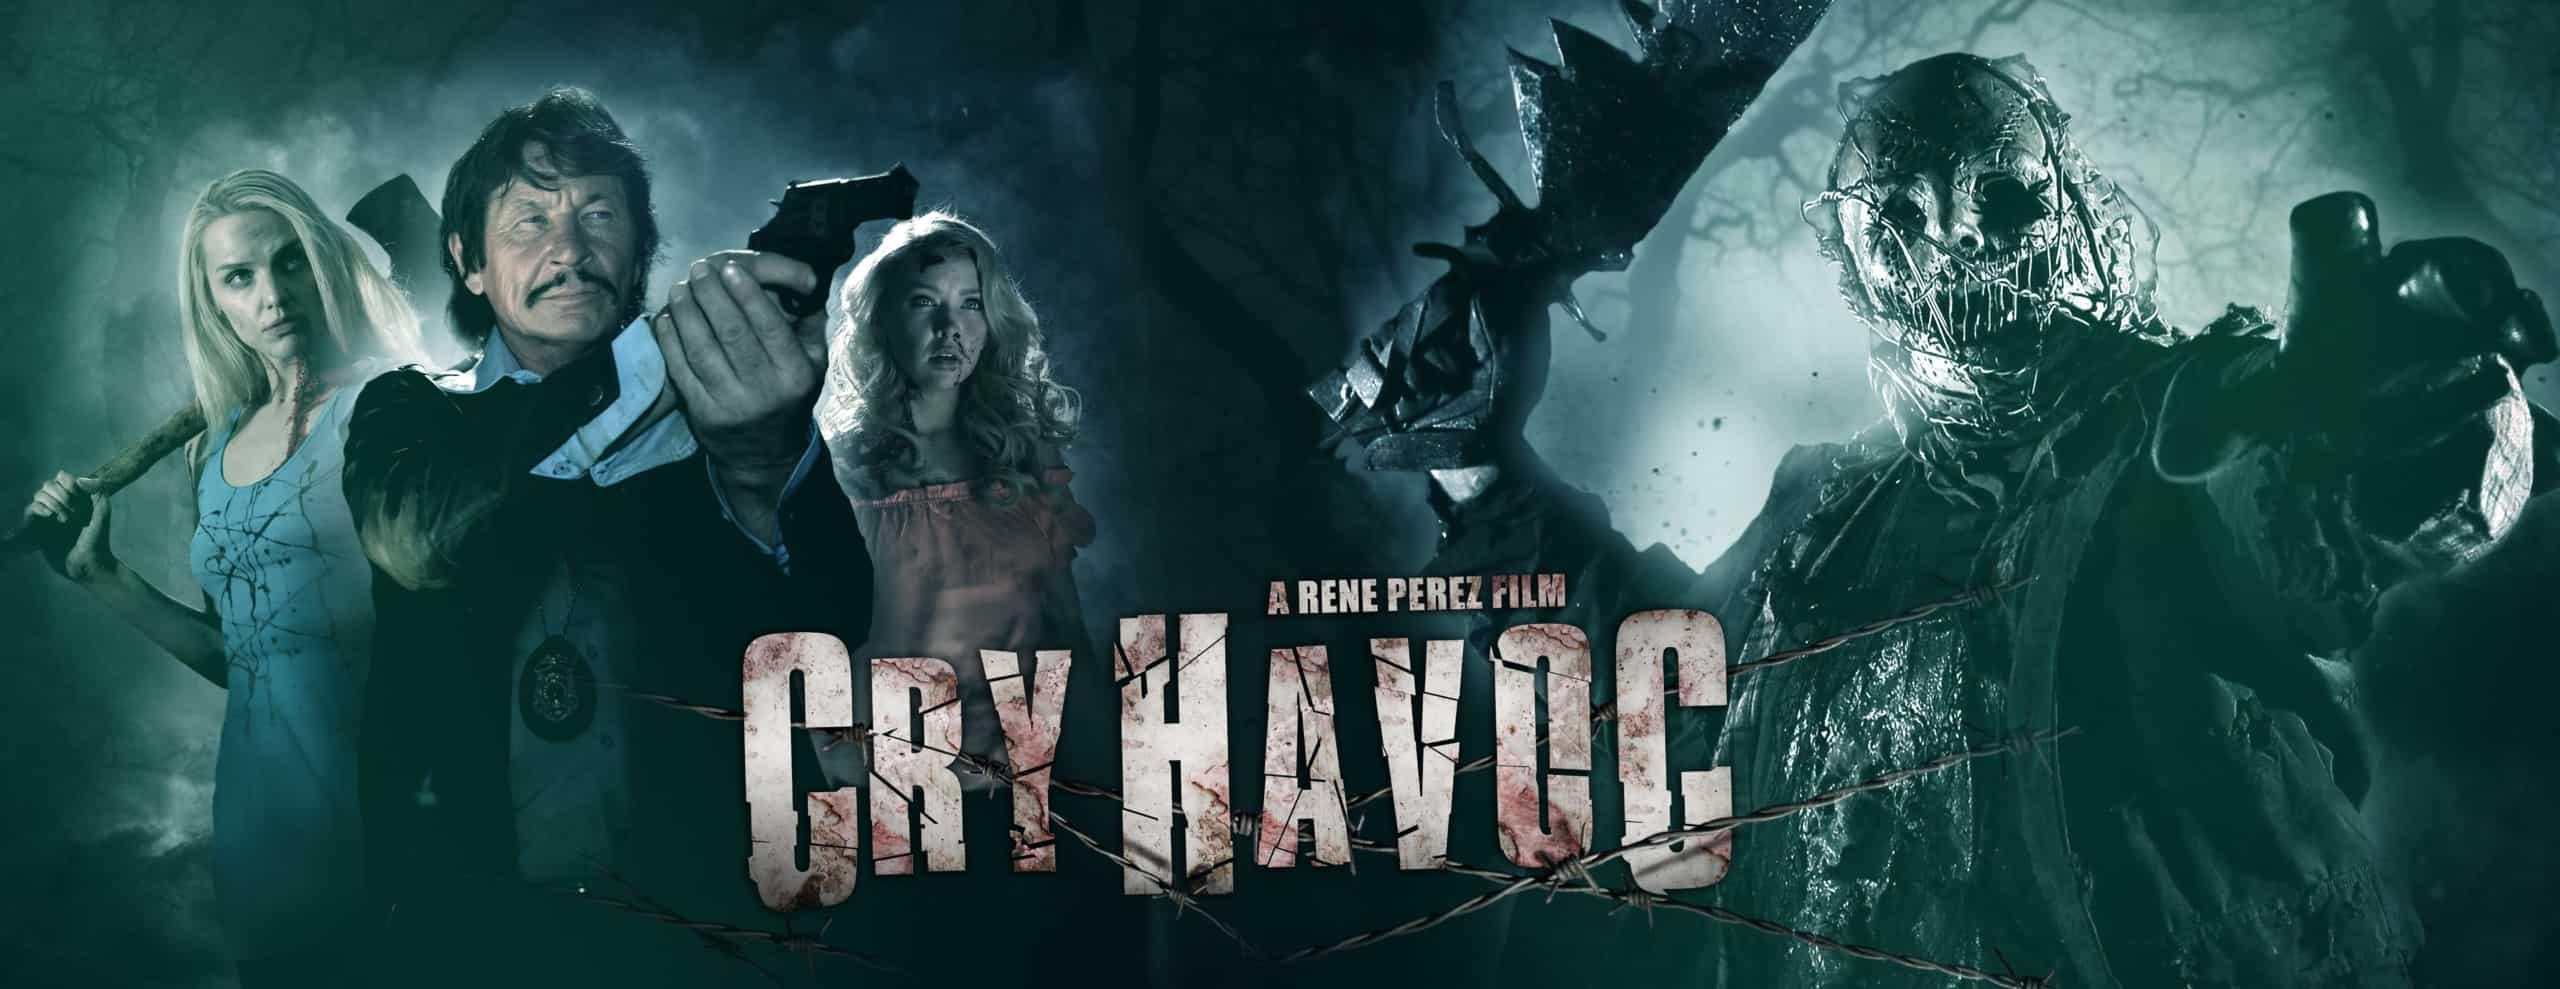 cry havoc banner